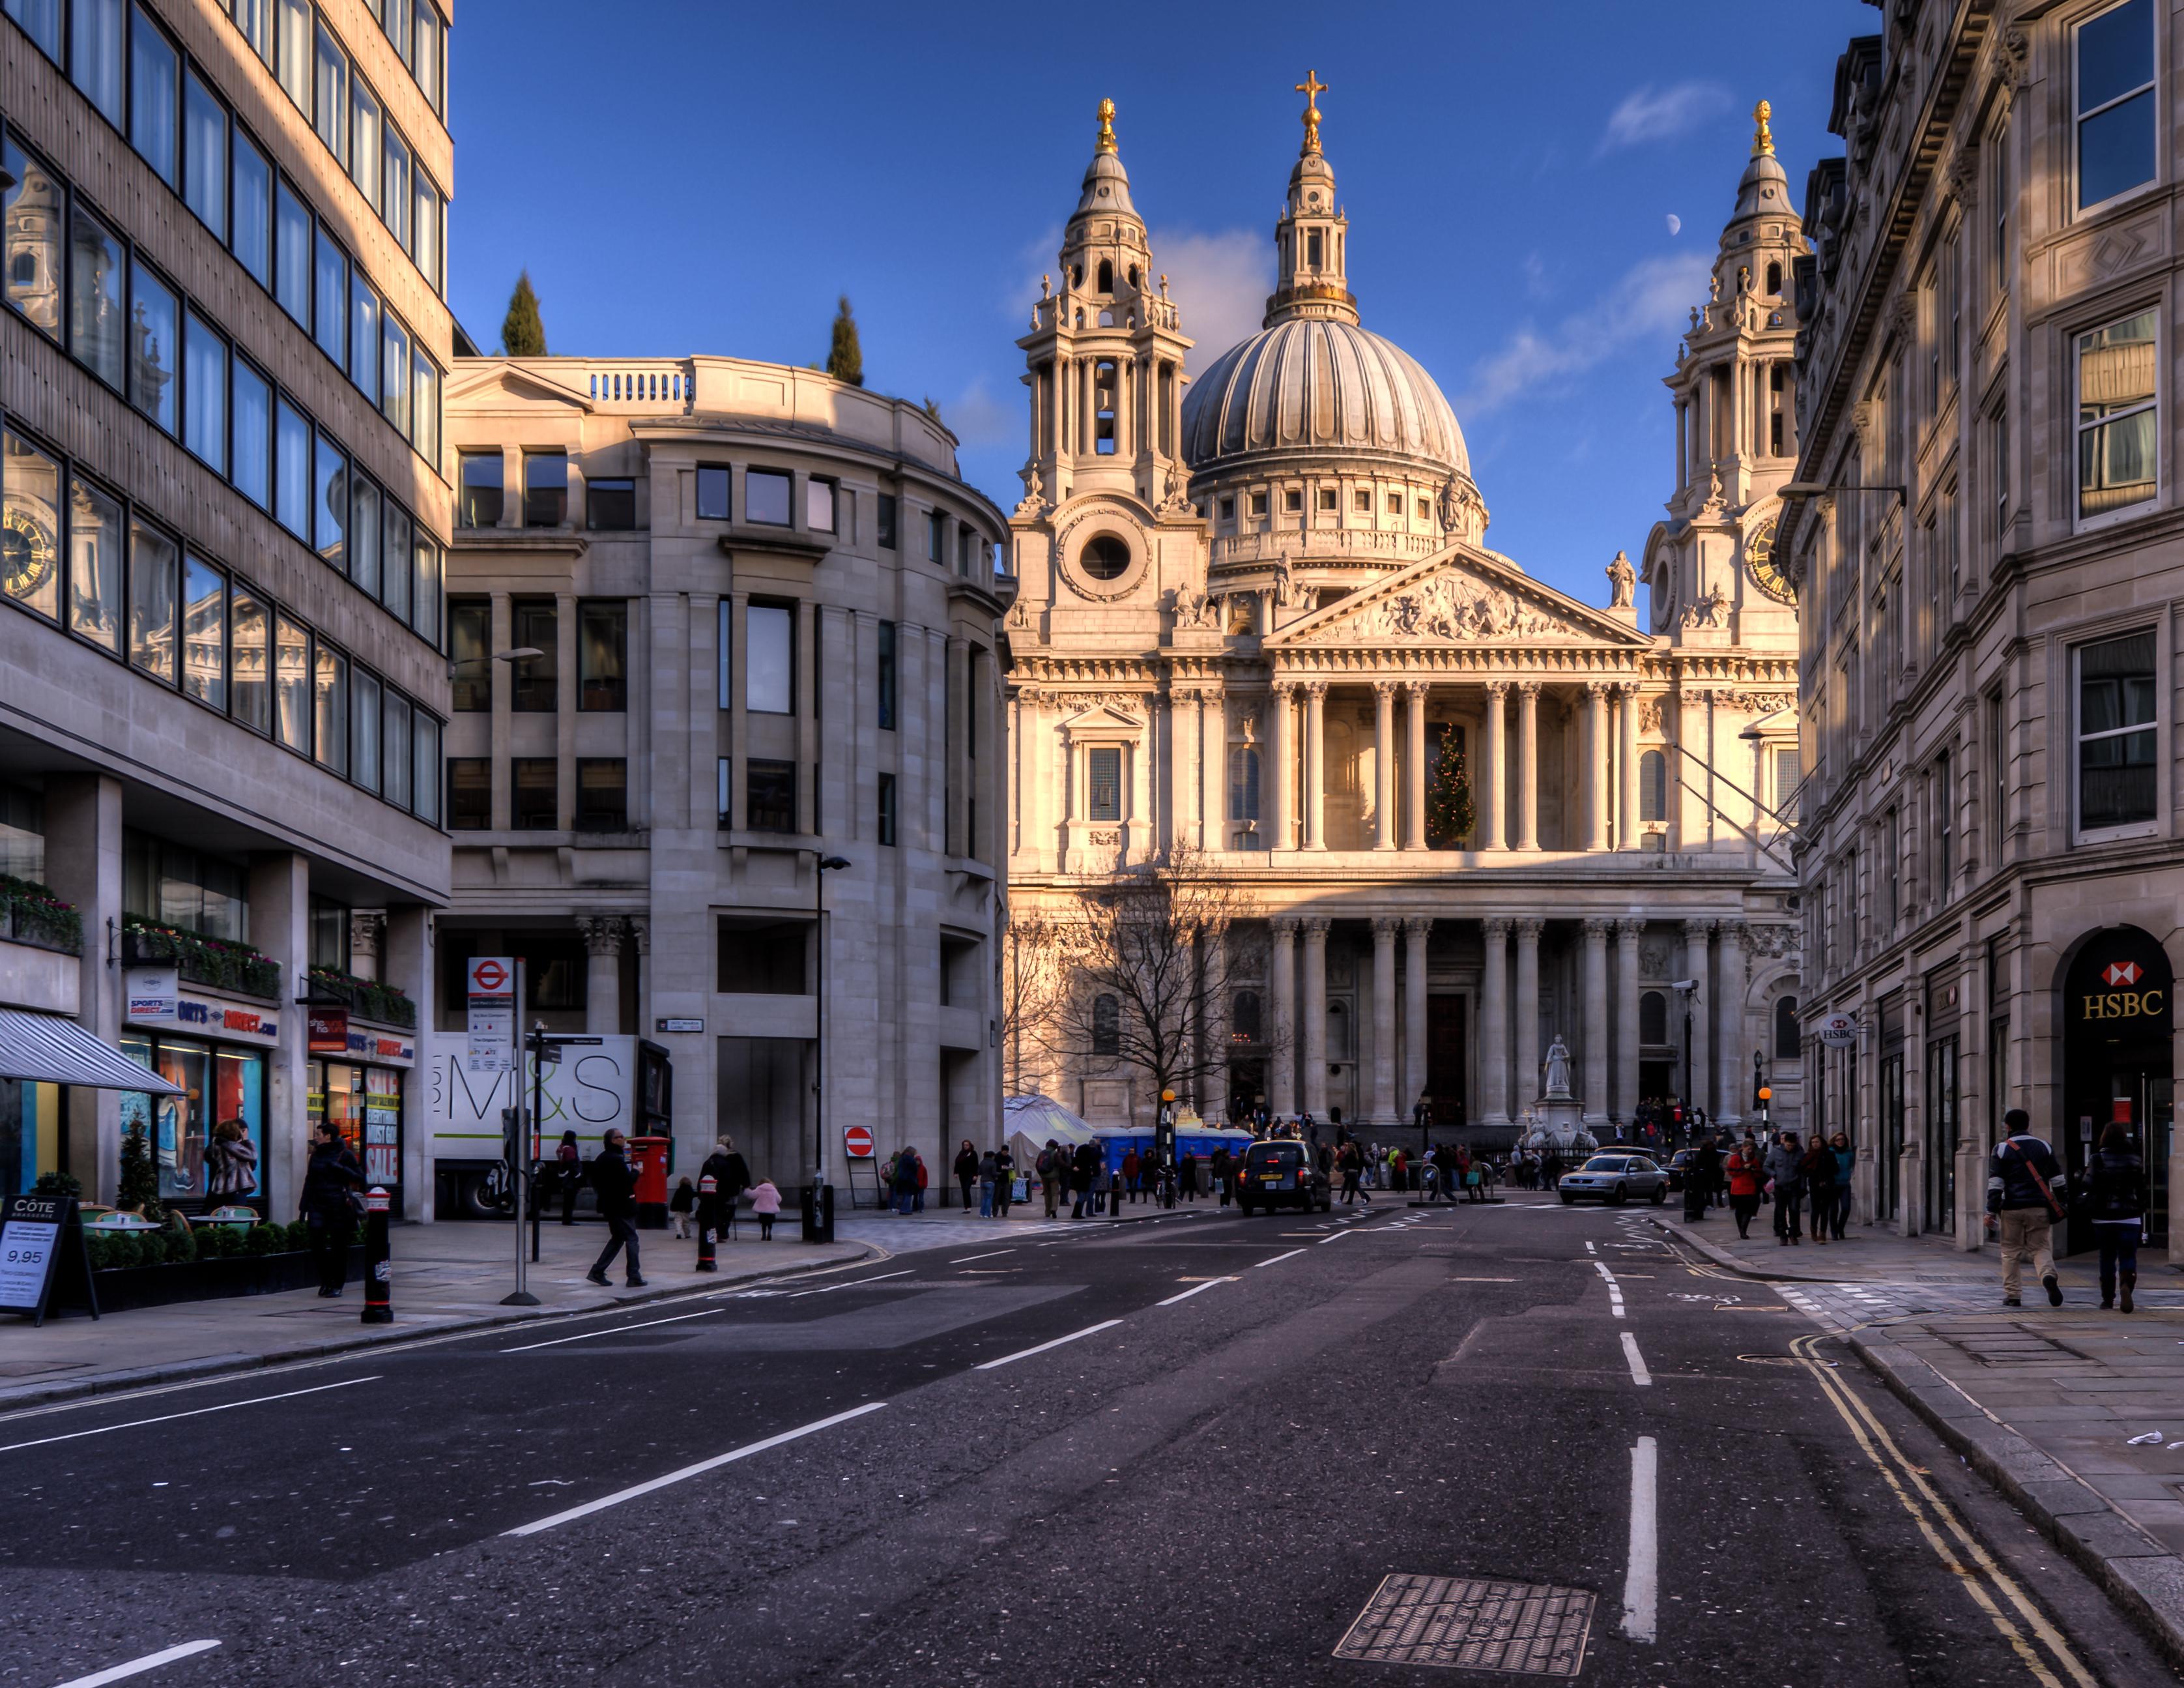 Cities_English_street_041183_